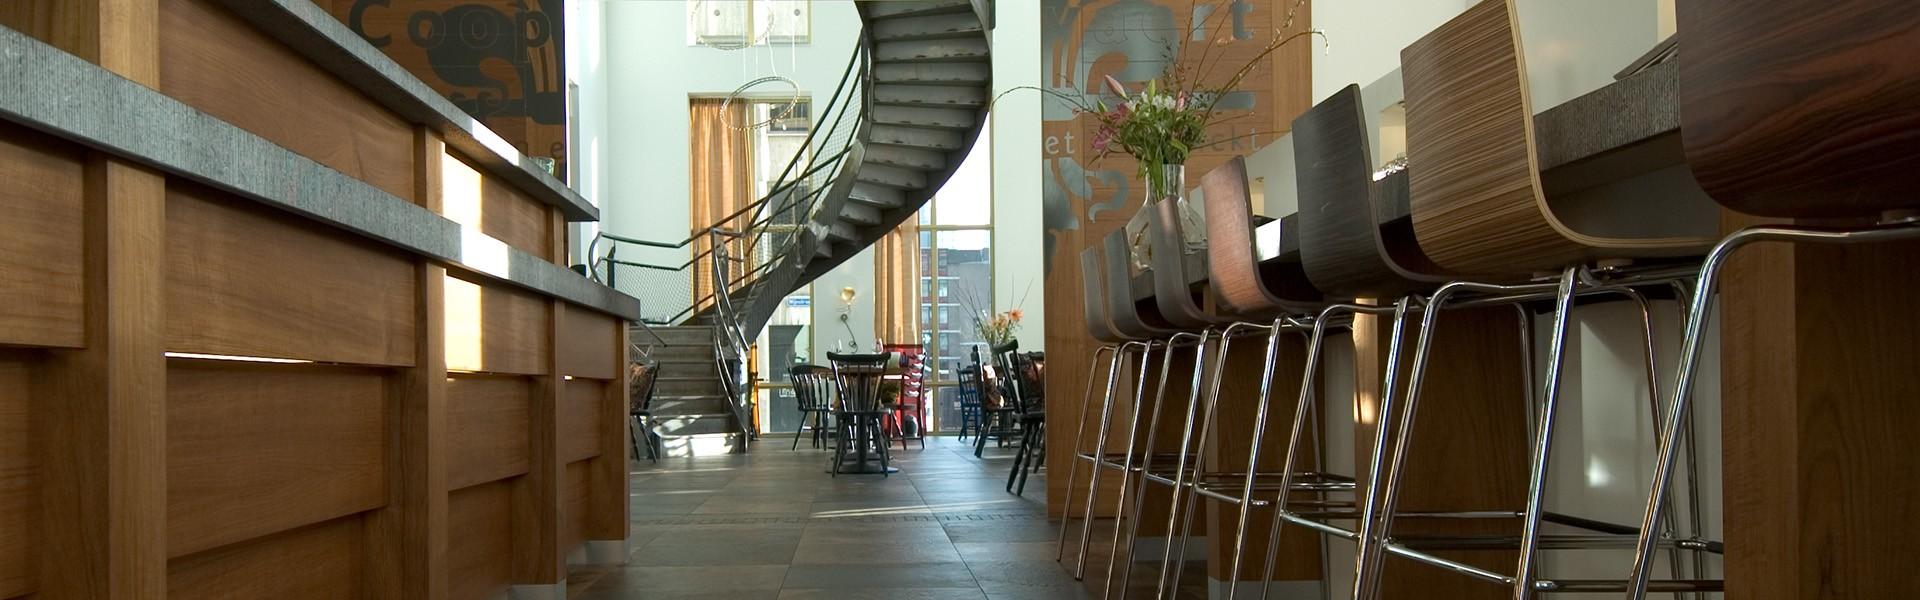 Restaurant Coopvaert Rotterdam